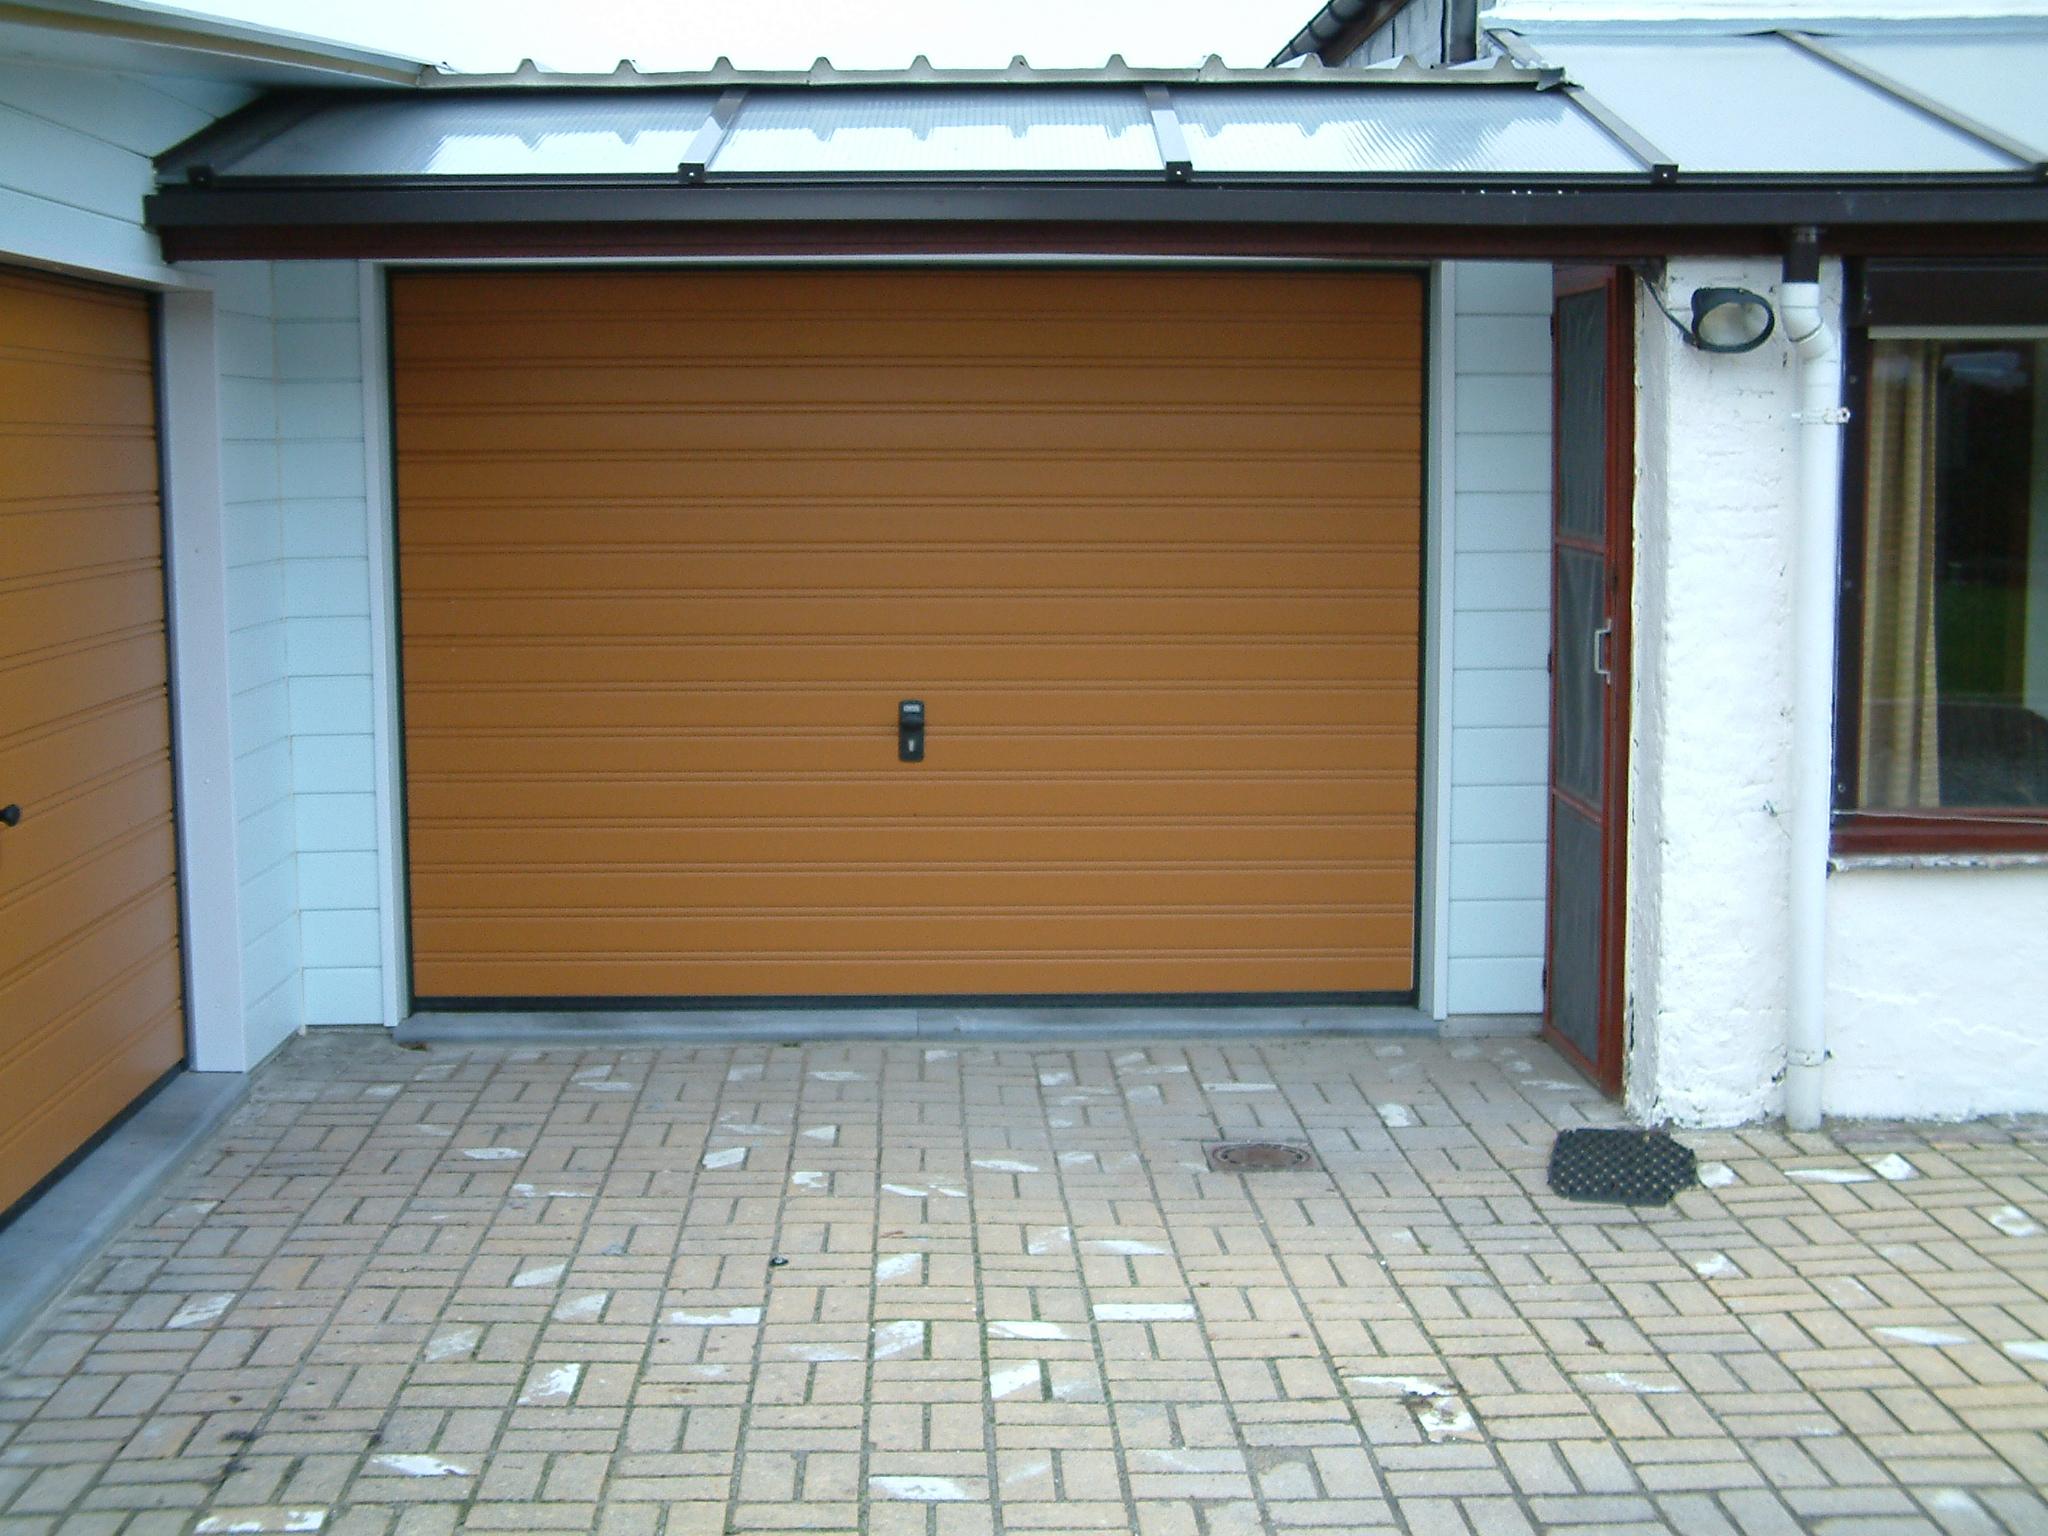 garagepoorten (4)